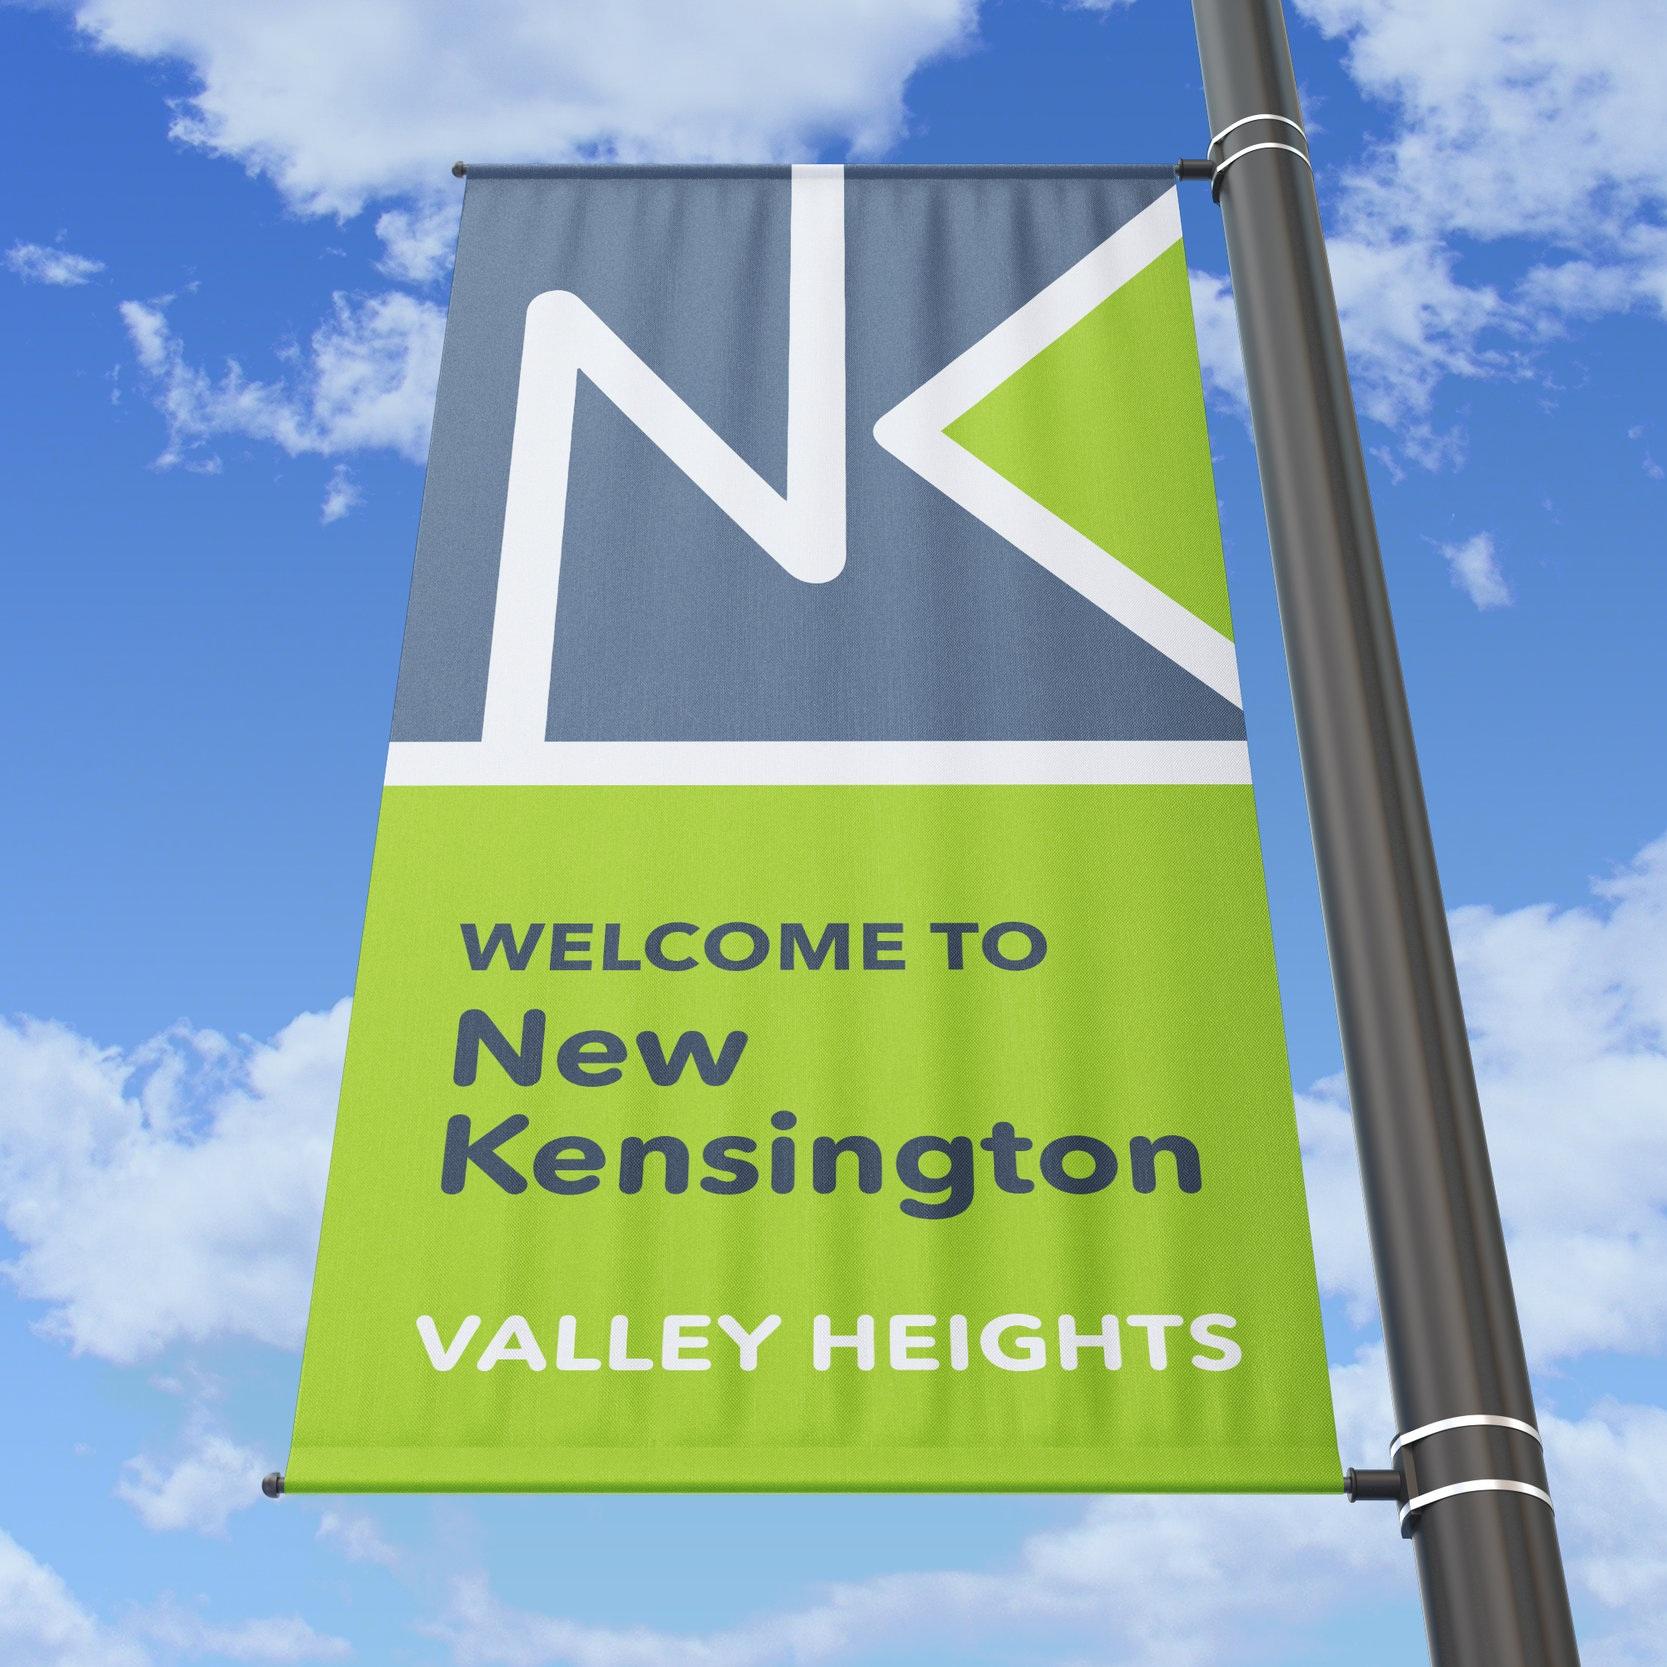 NewKen_Welcome_Poster_Concept2_ValleyHeights.jpg